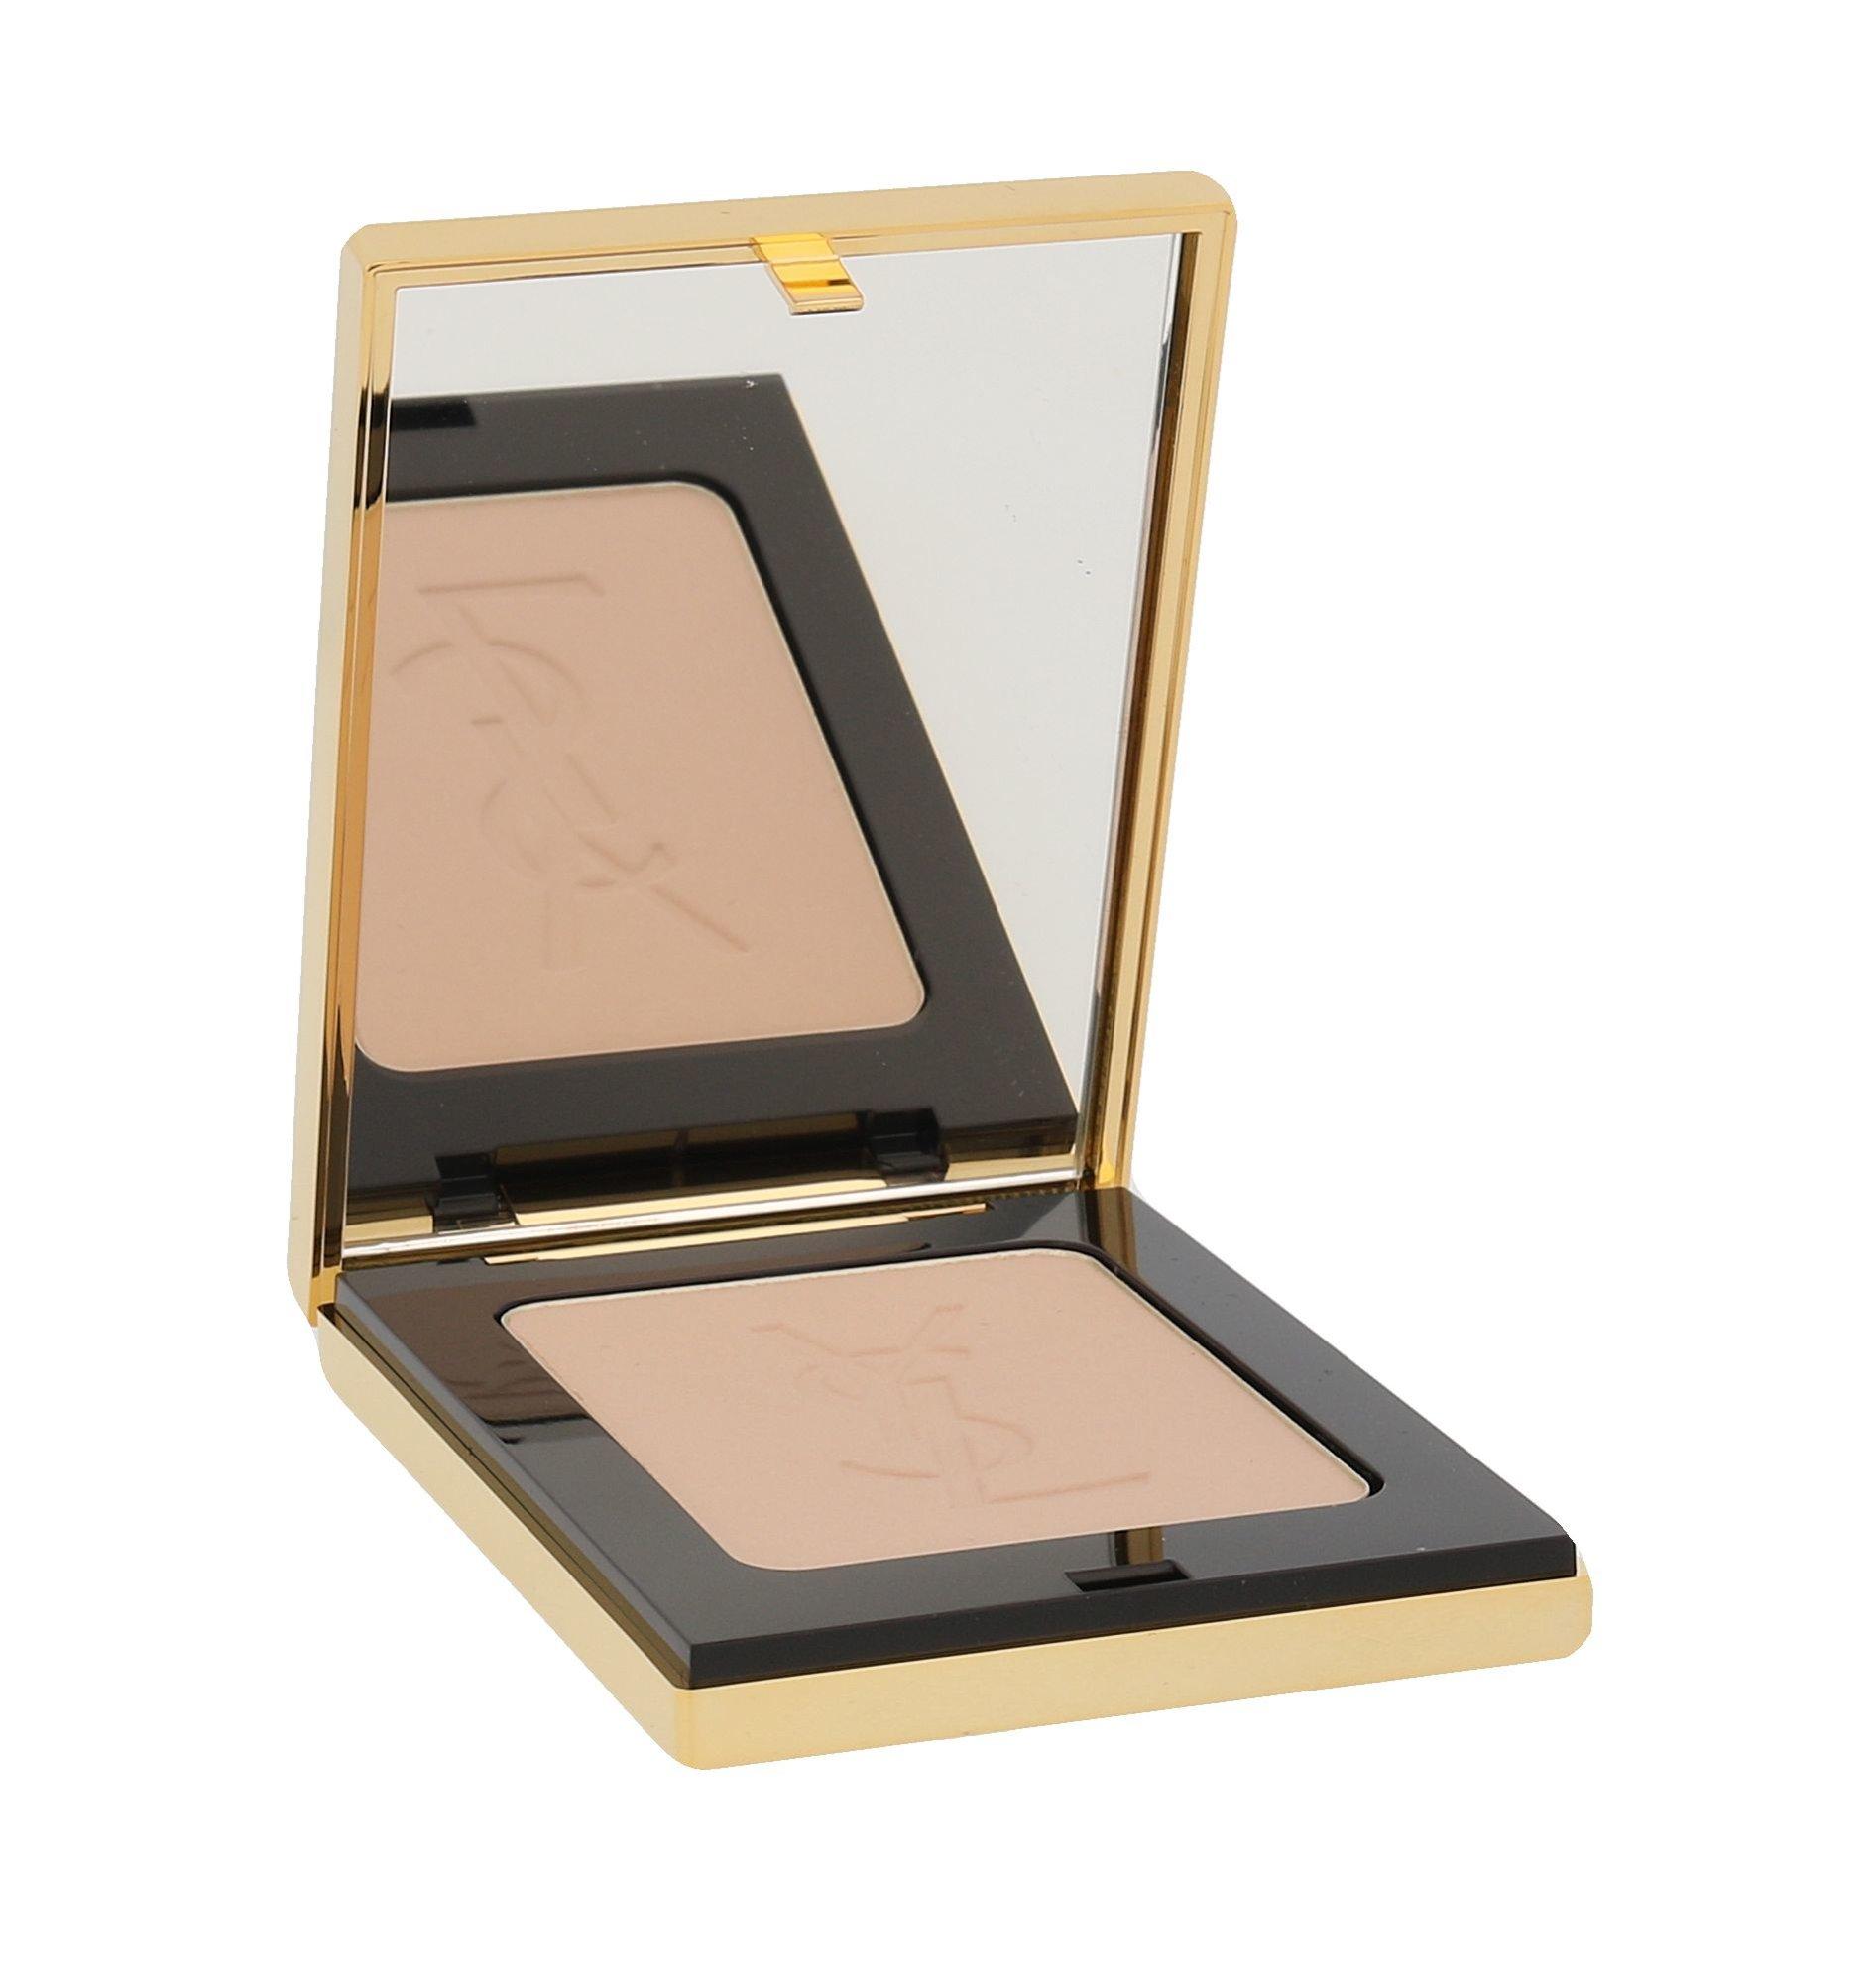 Yves Saint Laurent Matt And Radiant Cosmetic 8,5ml 4 Pink Beige